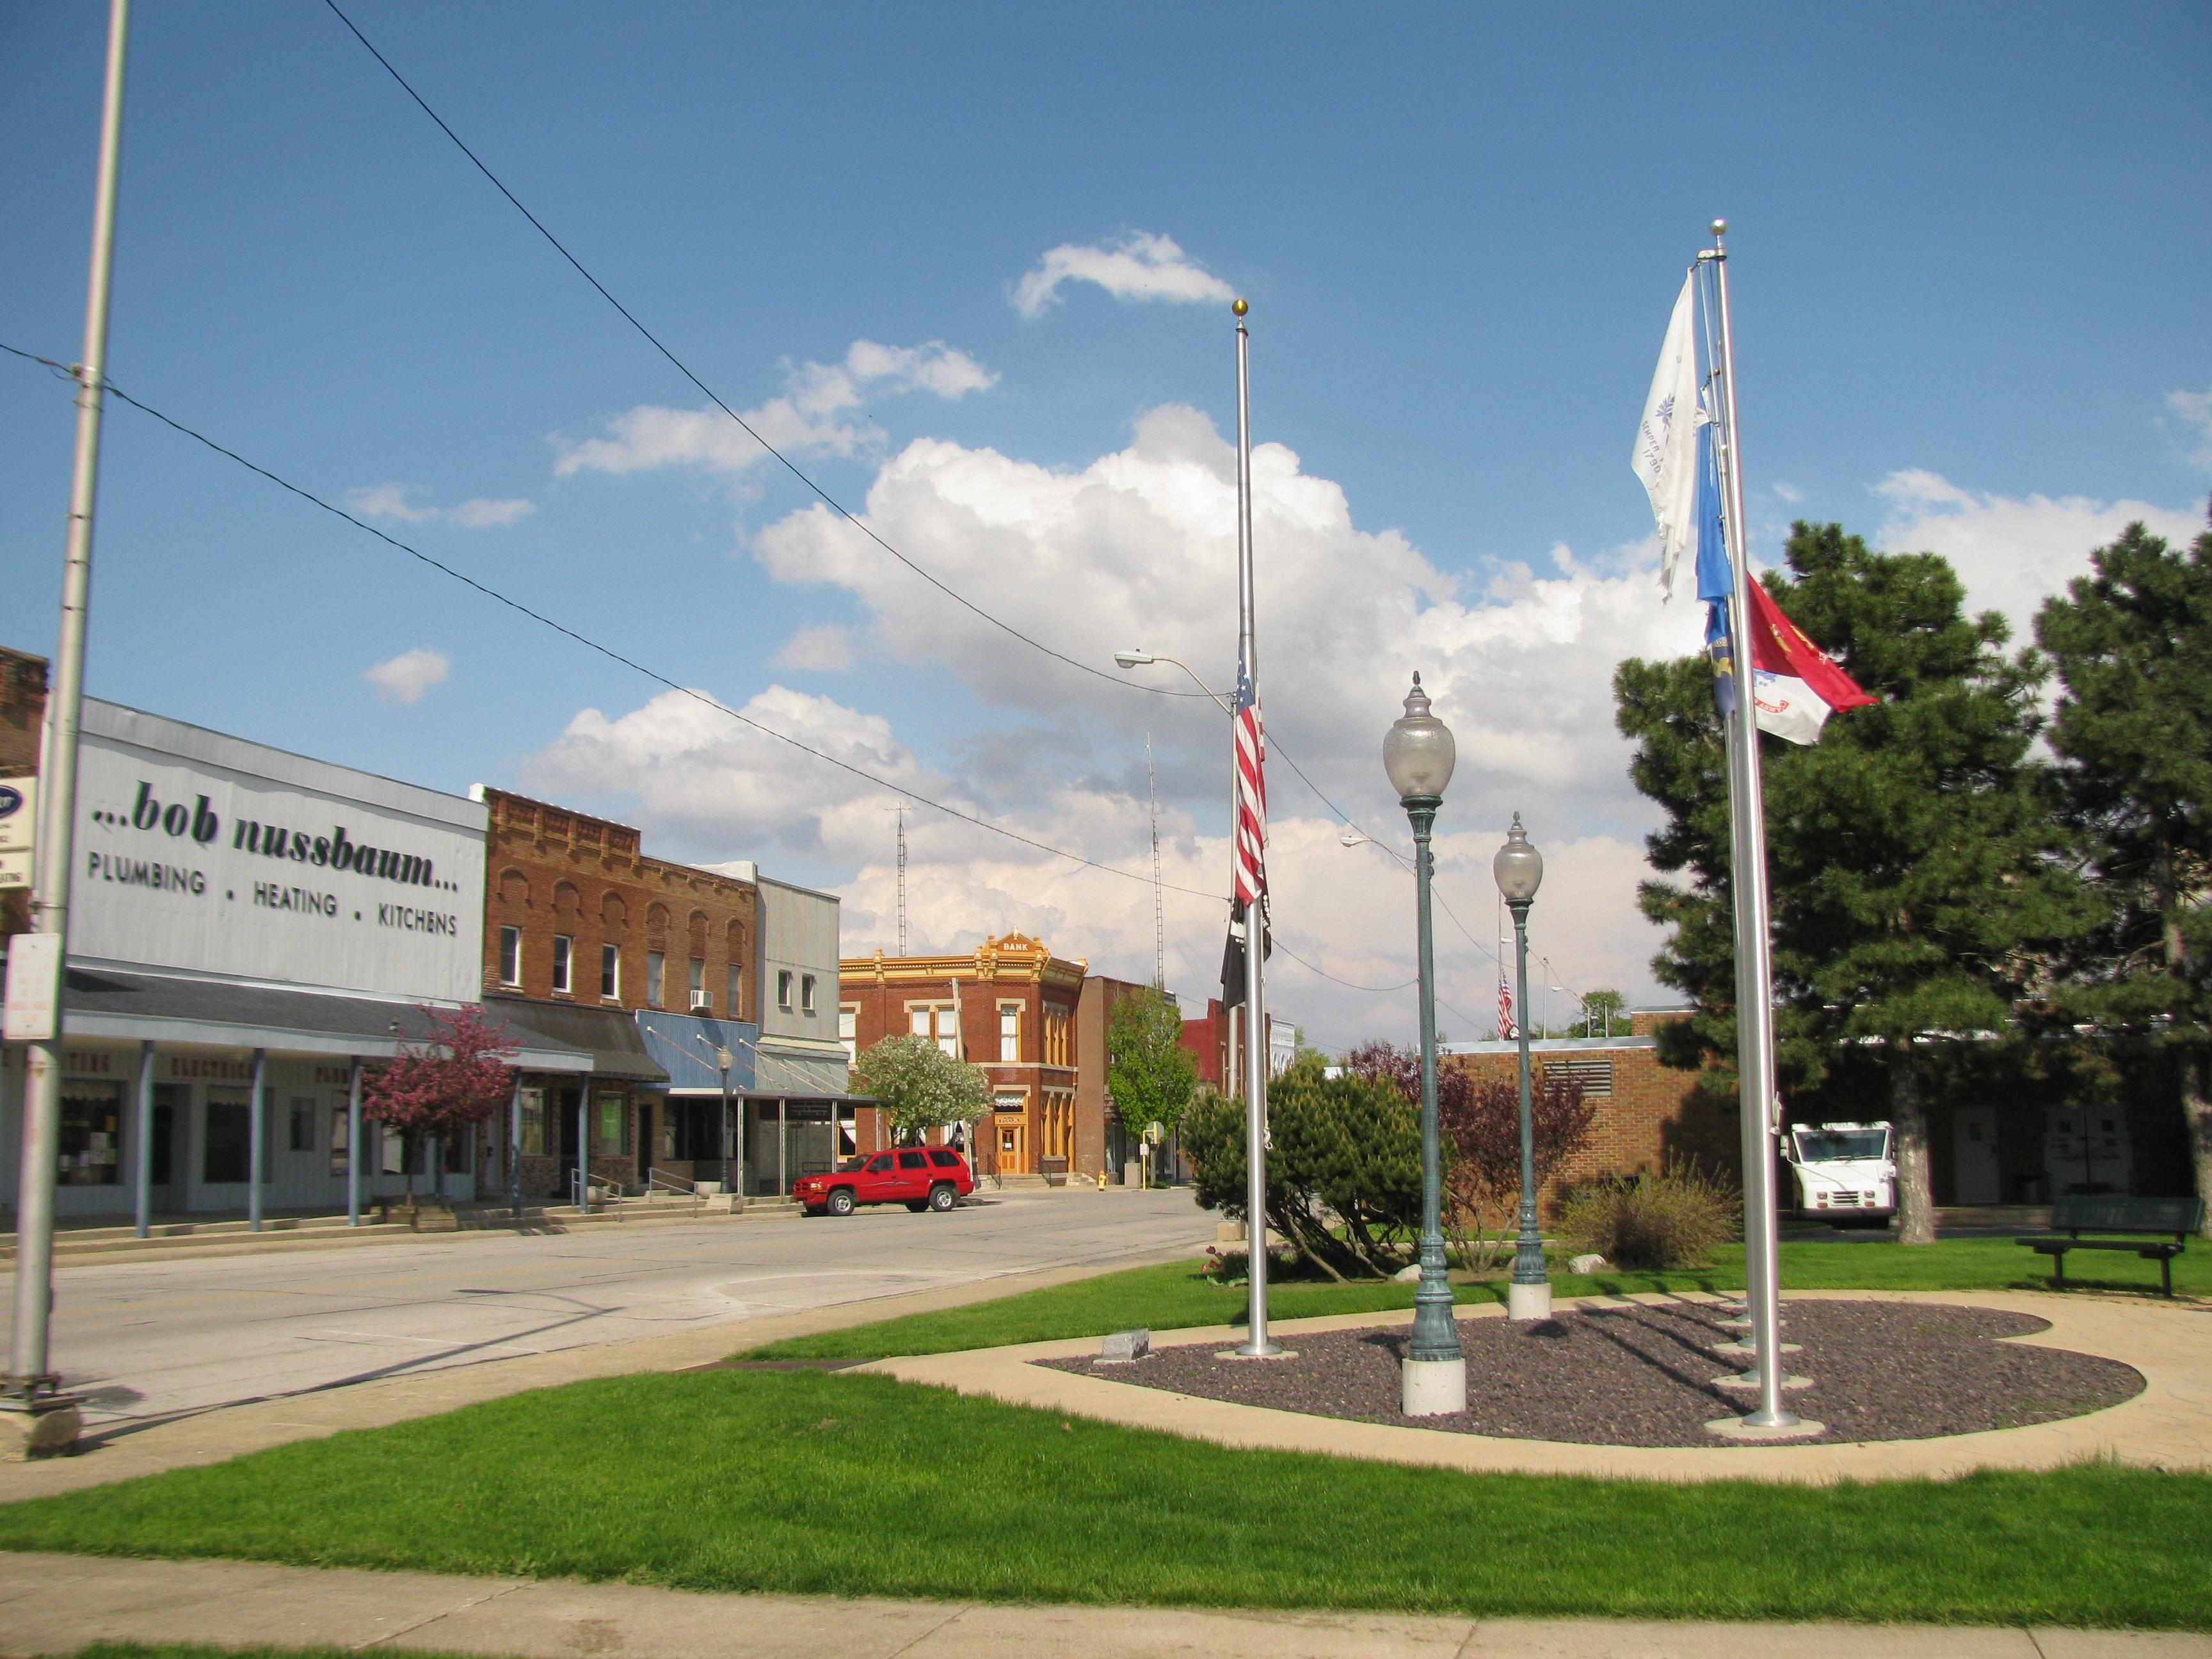 Downtown Fairbury Illinois Attractions